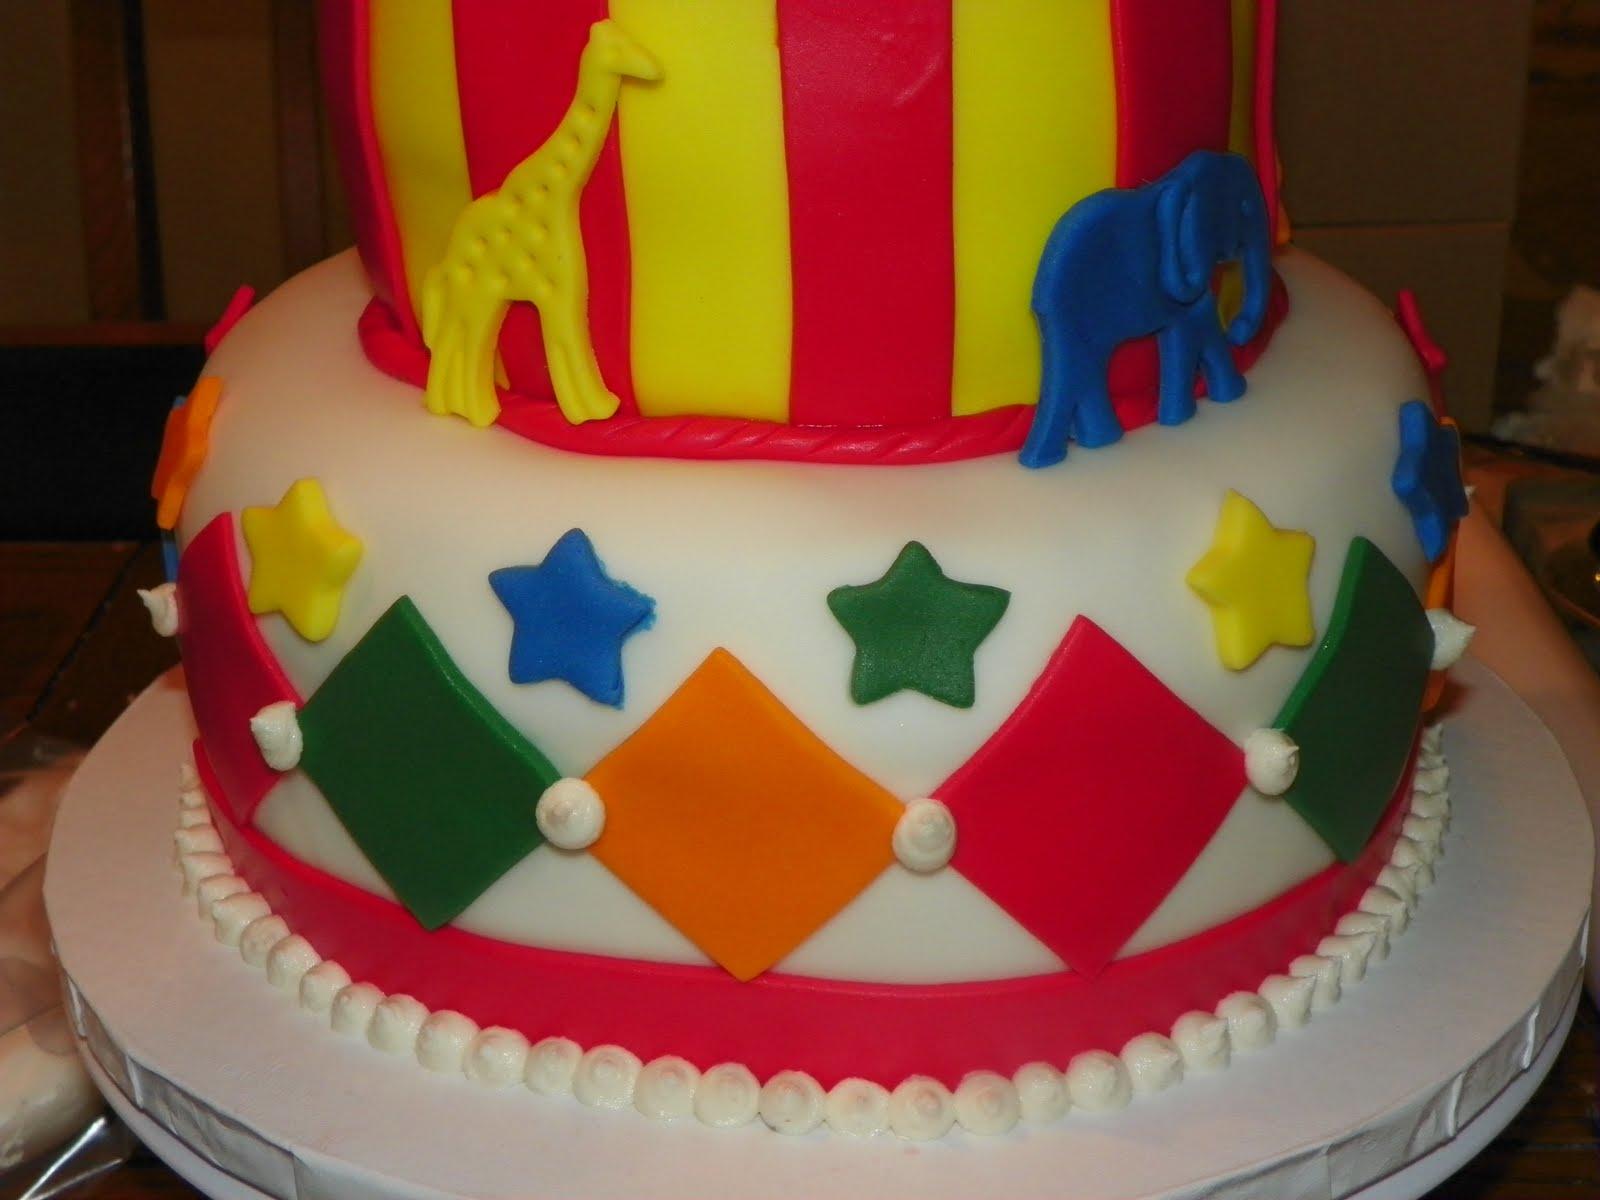 Circus Tent Birthday Cake u0026 Cupcakes & Plumeria Cake Studio: Circus Tent Birthday Cake u0026 Cupcakes